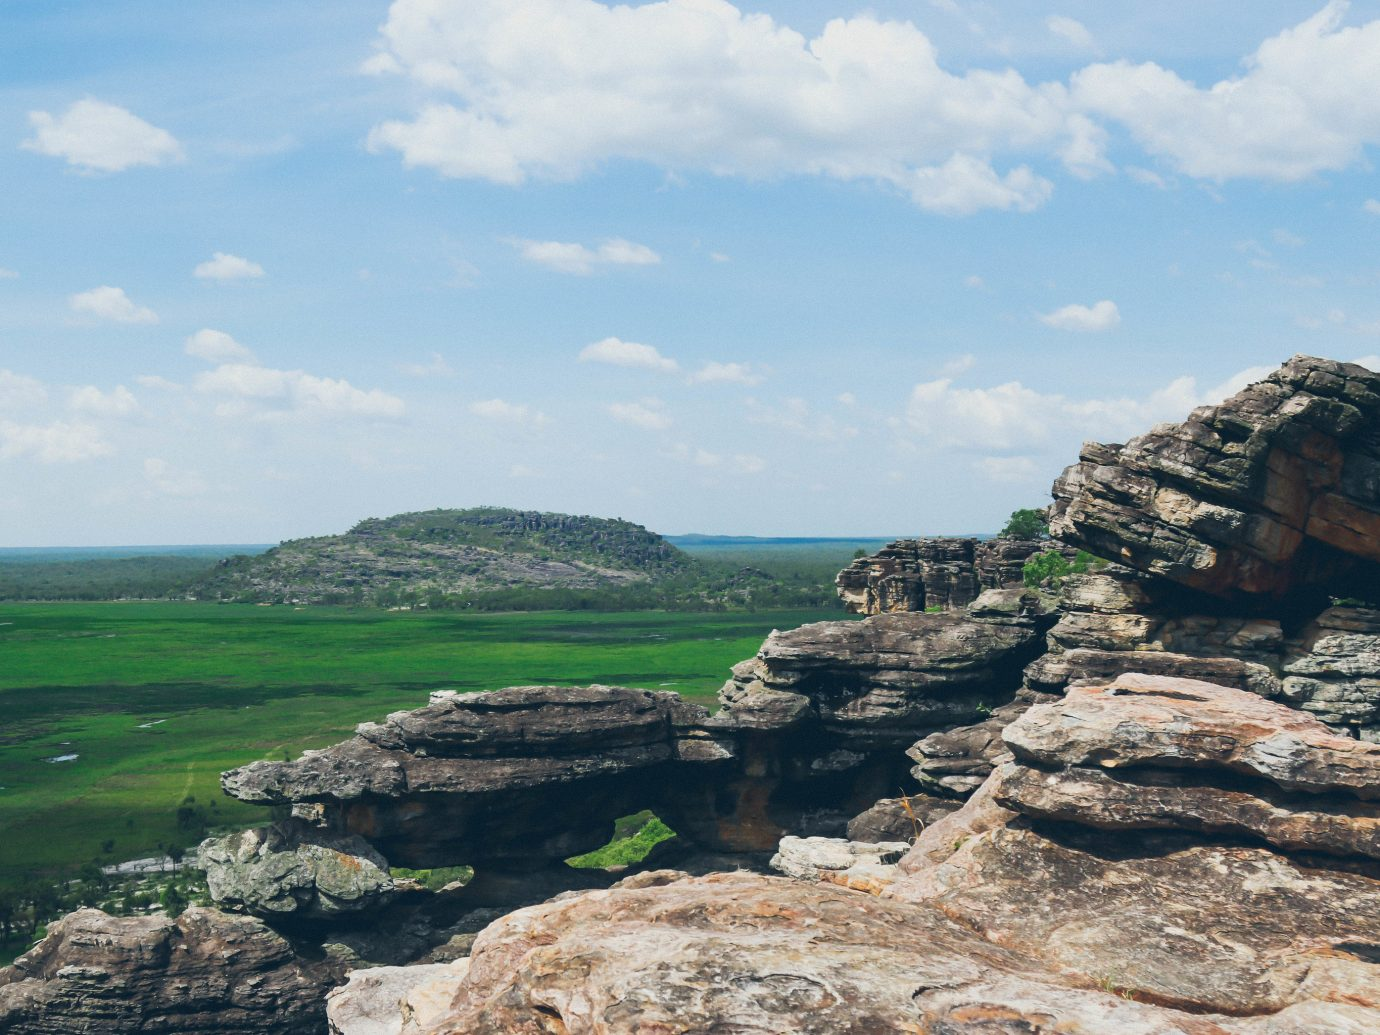 Trip Ideas rock outdoor sky grass rocky mountain Nature landform Coast geographical feature cliff Sea badlands terrain Ocean geology cape landscape plateau bay formation material overlooking hillside